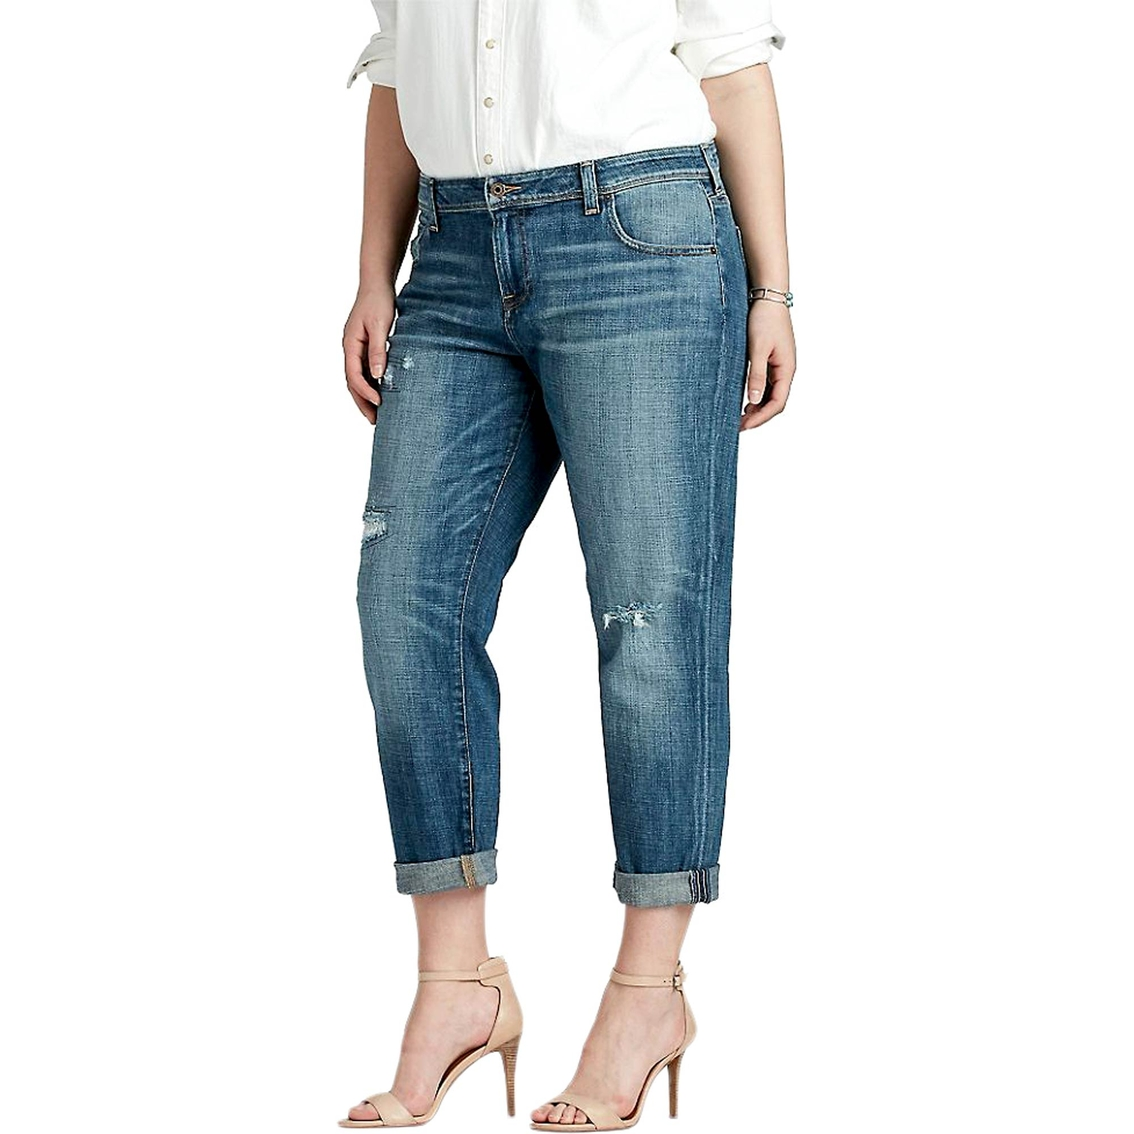 c0f2eb7a3e6 Lucky Brand Plus Size Reese Boyfriend Jeans